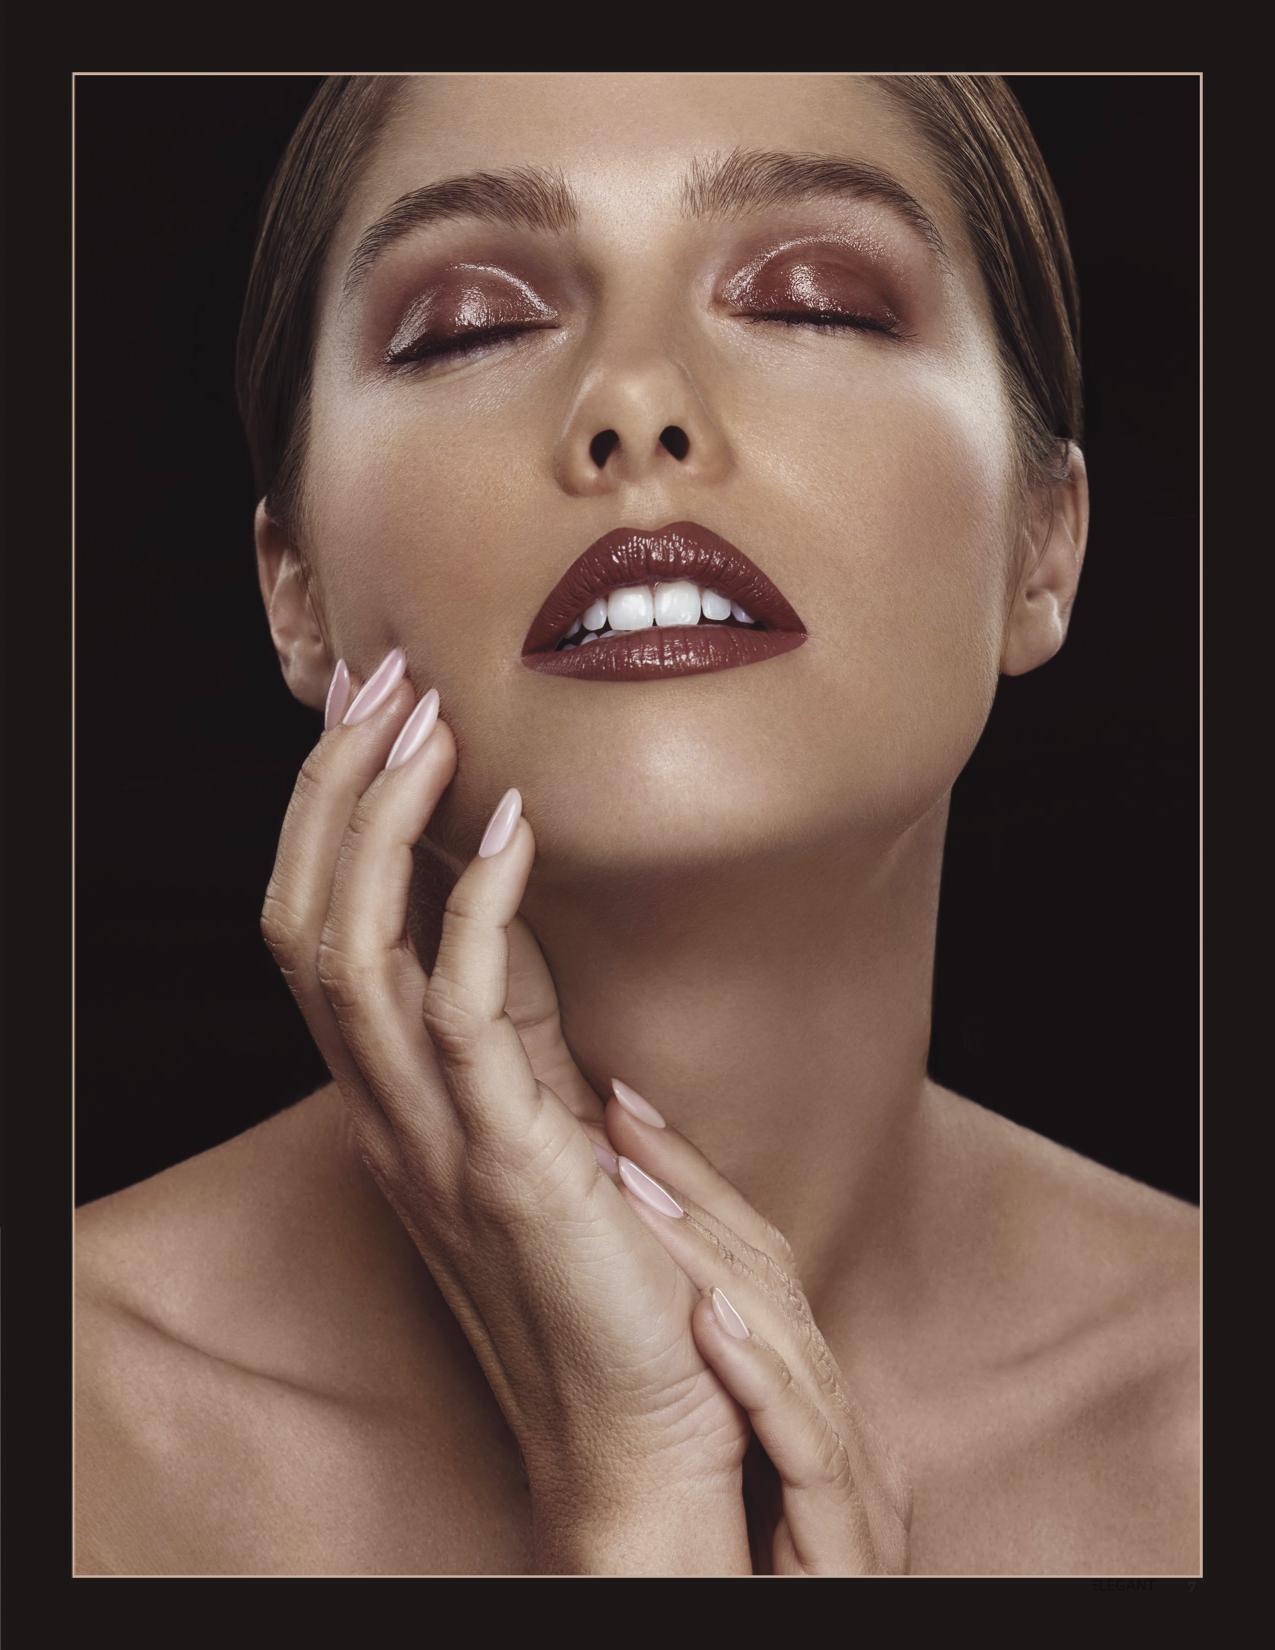 Glossy eye lids published in Elegant Magazine